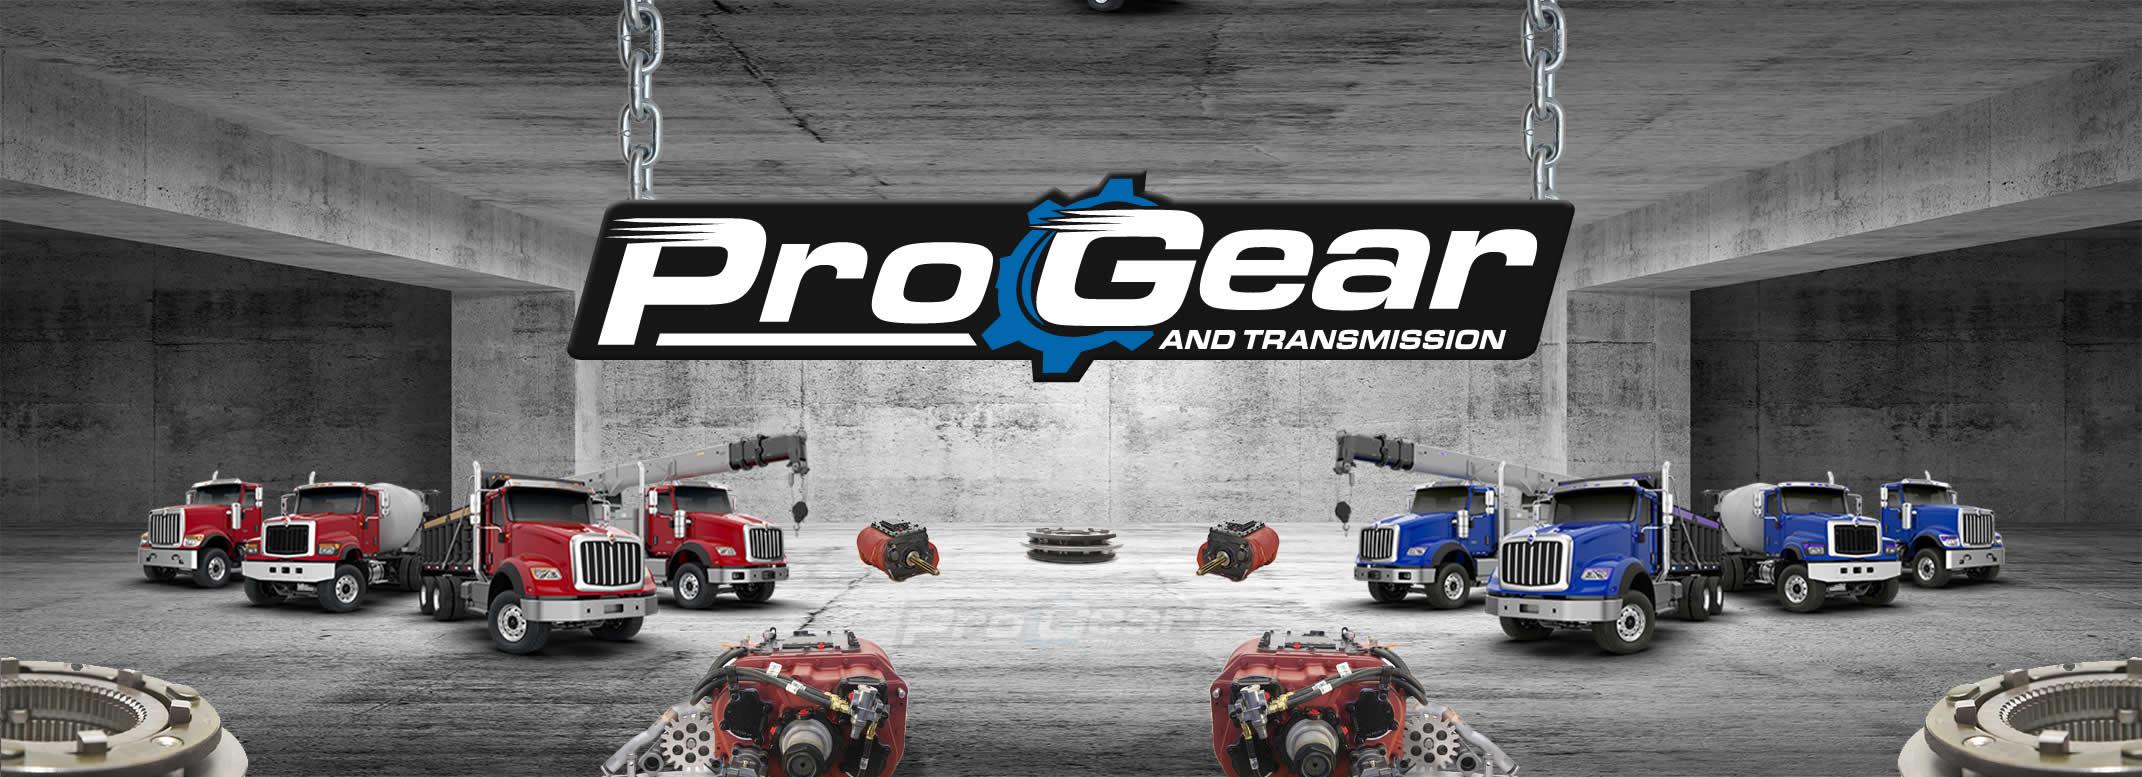 Pro Gear & Transmission